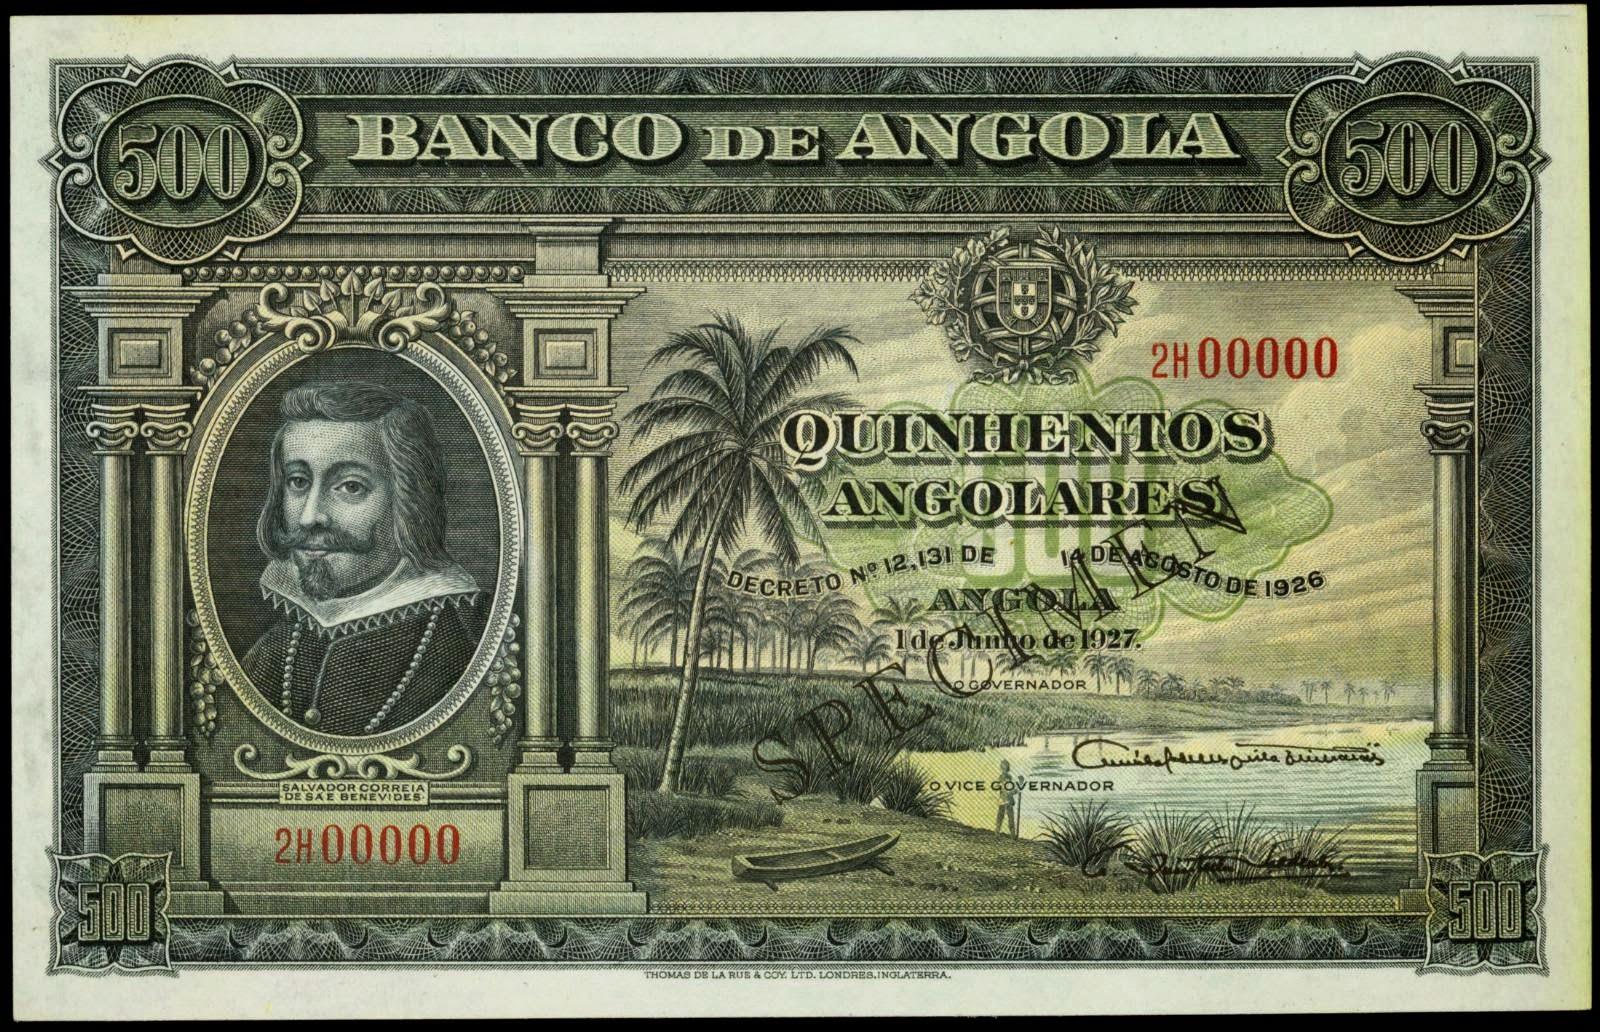 Angola 500 Angolares banknote 1927 Salvador Correia